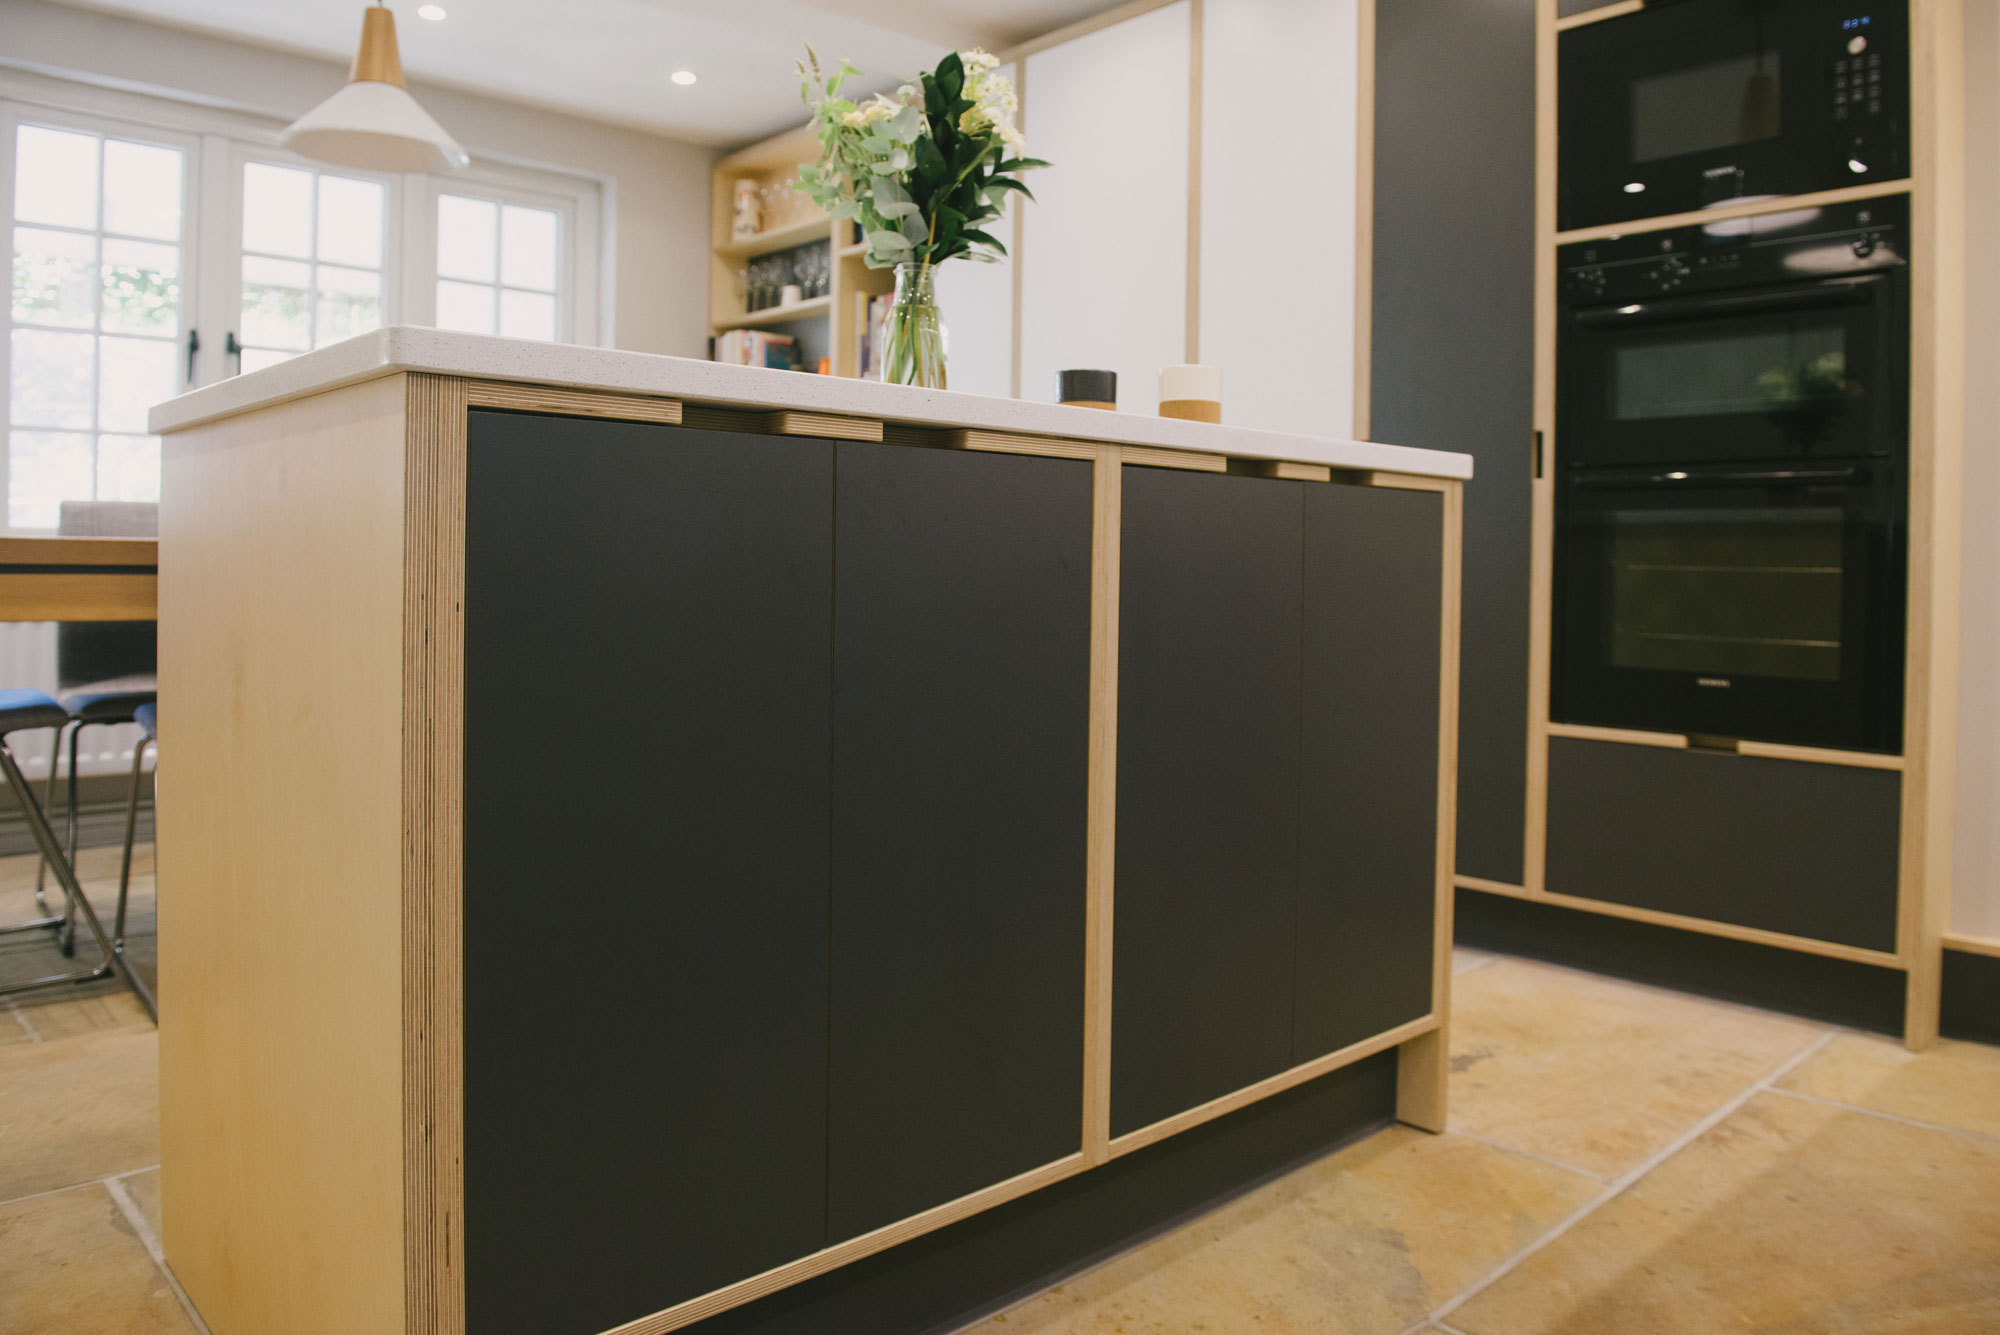 Corian surfaced plywood kitchen island unit